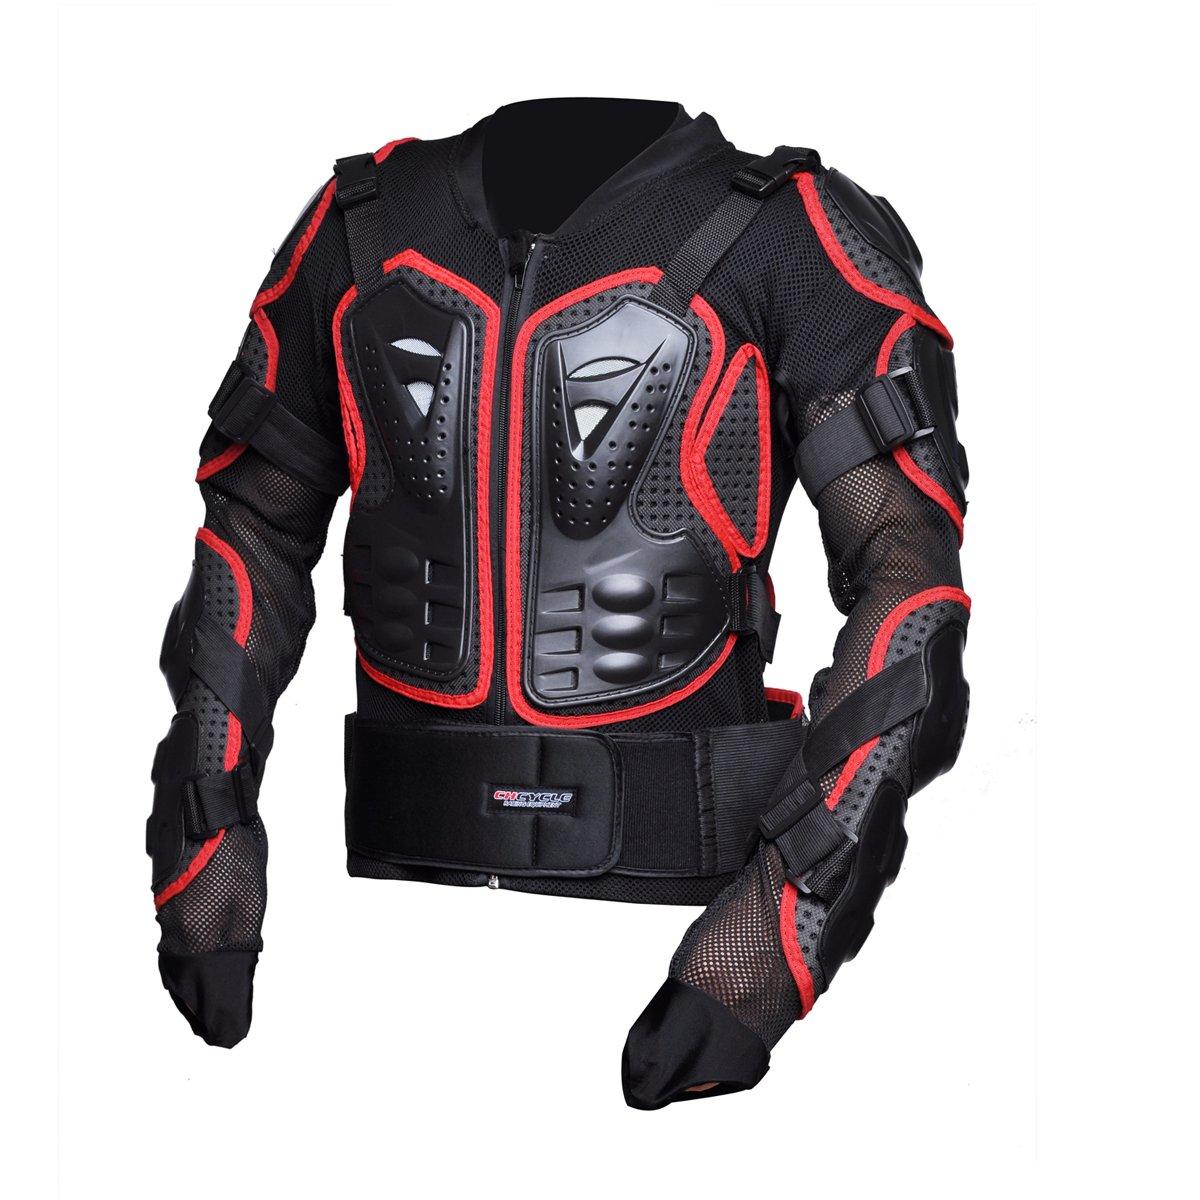 CHCYCLE Motorcycle Full Body Armor Motocross ATV Motorbike Jacket Protector (Medium, Red) by CHCYCLE